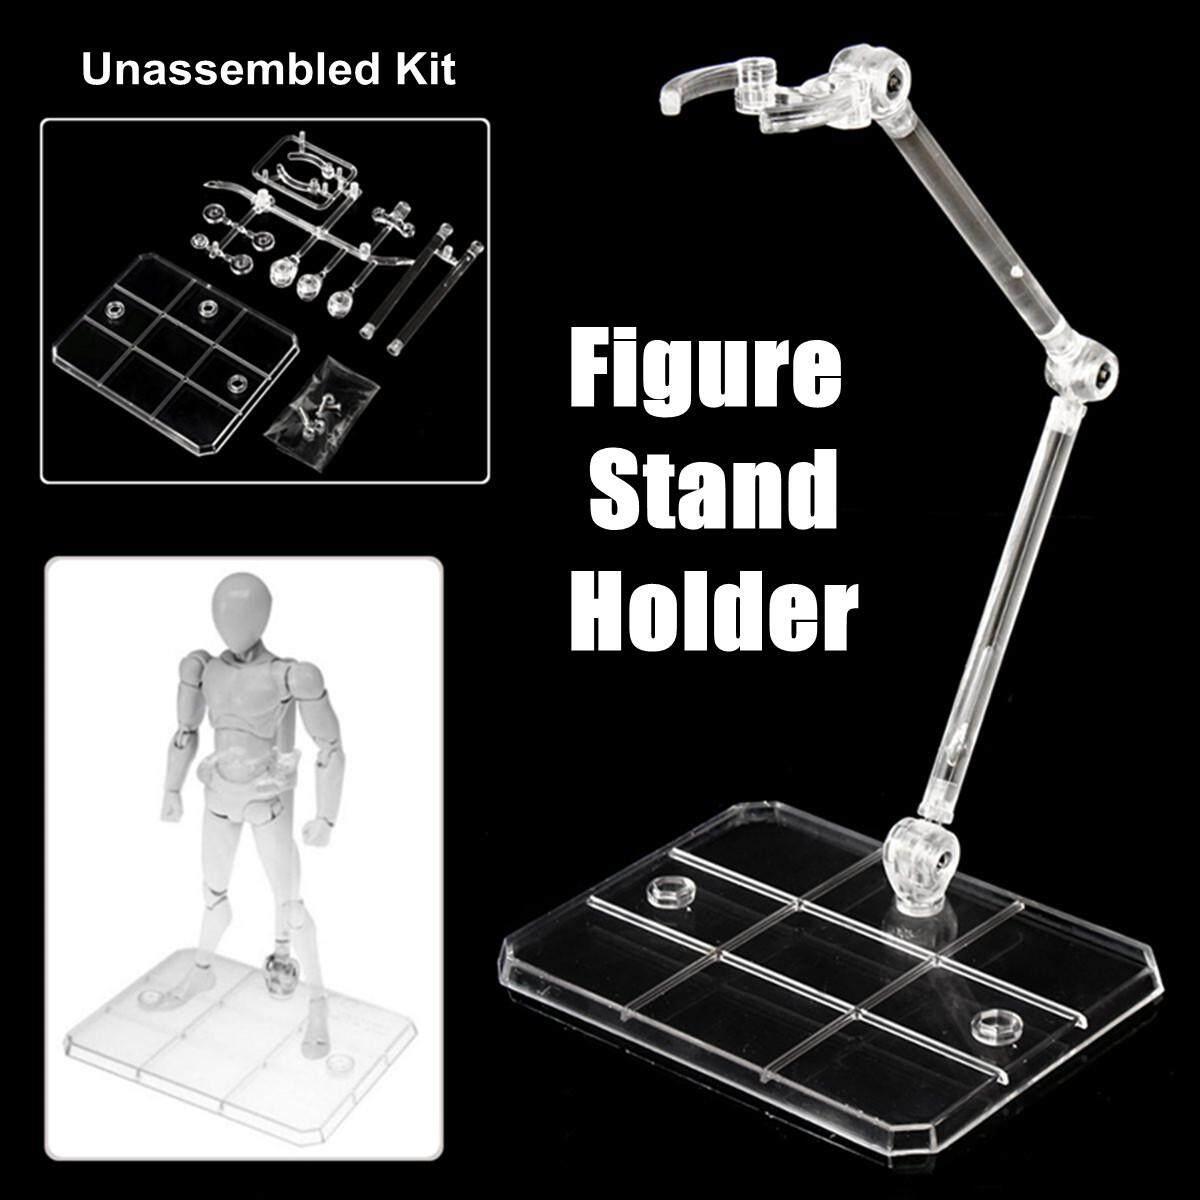 SHF Figma Action Figure Base Stand Holder Fit For Bandai HG RG SD Gundam  Model